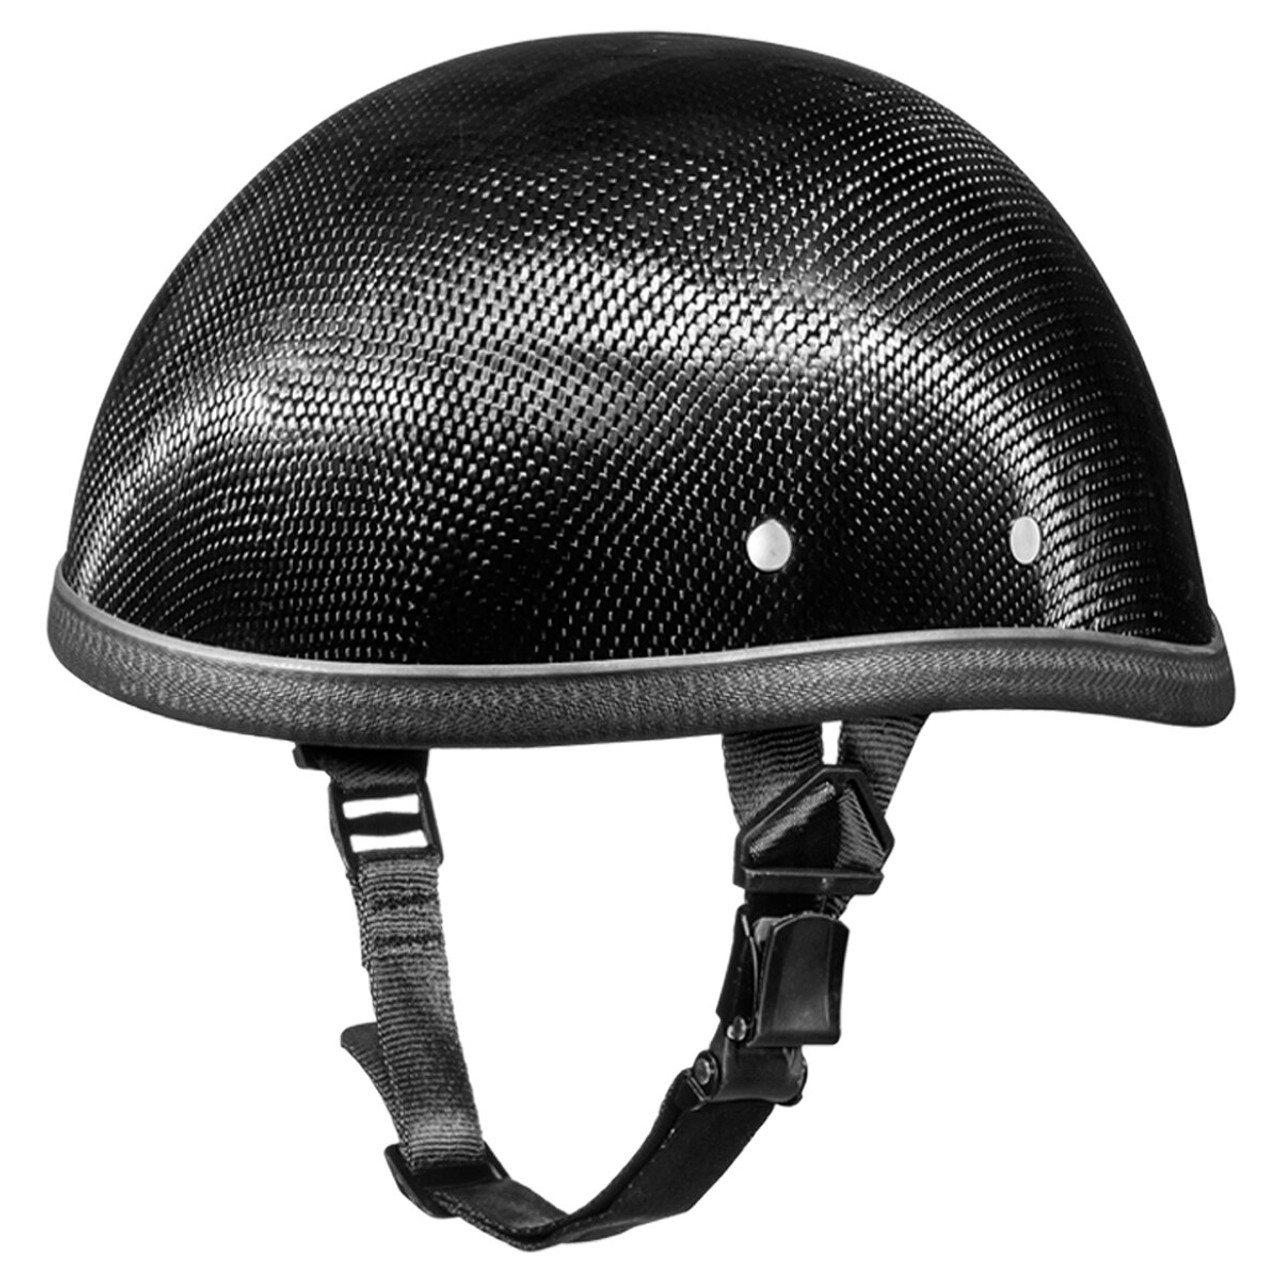 Daytona Helmets Eagle Leather Covered